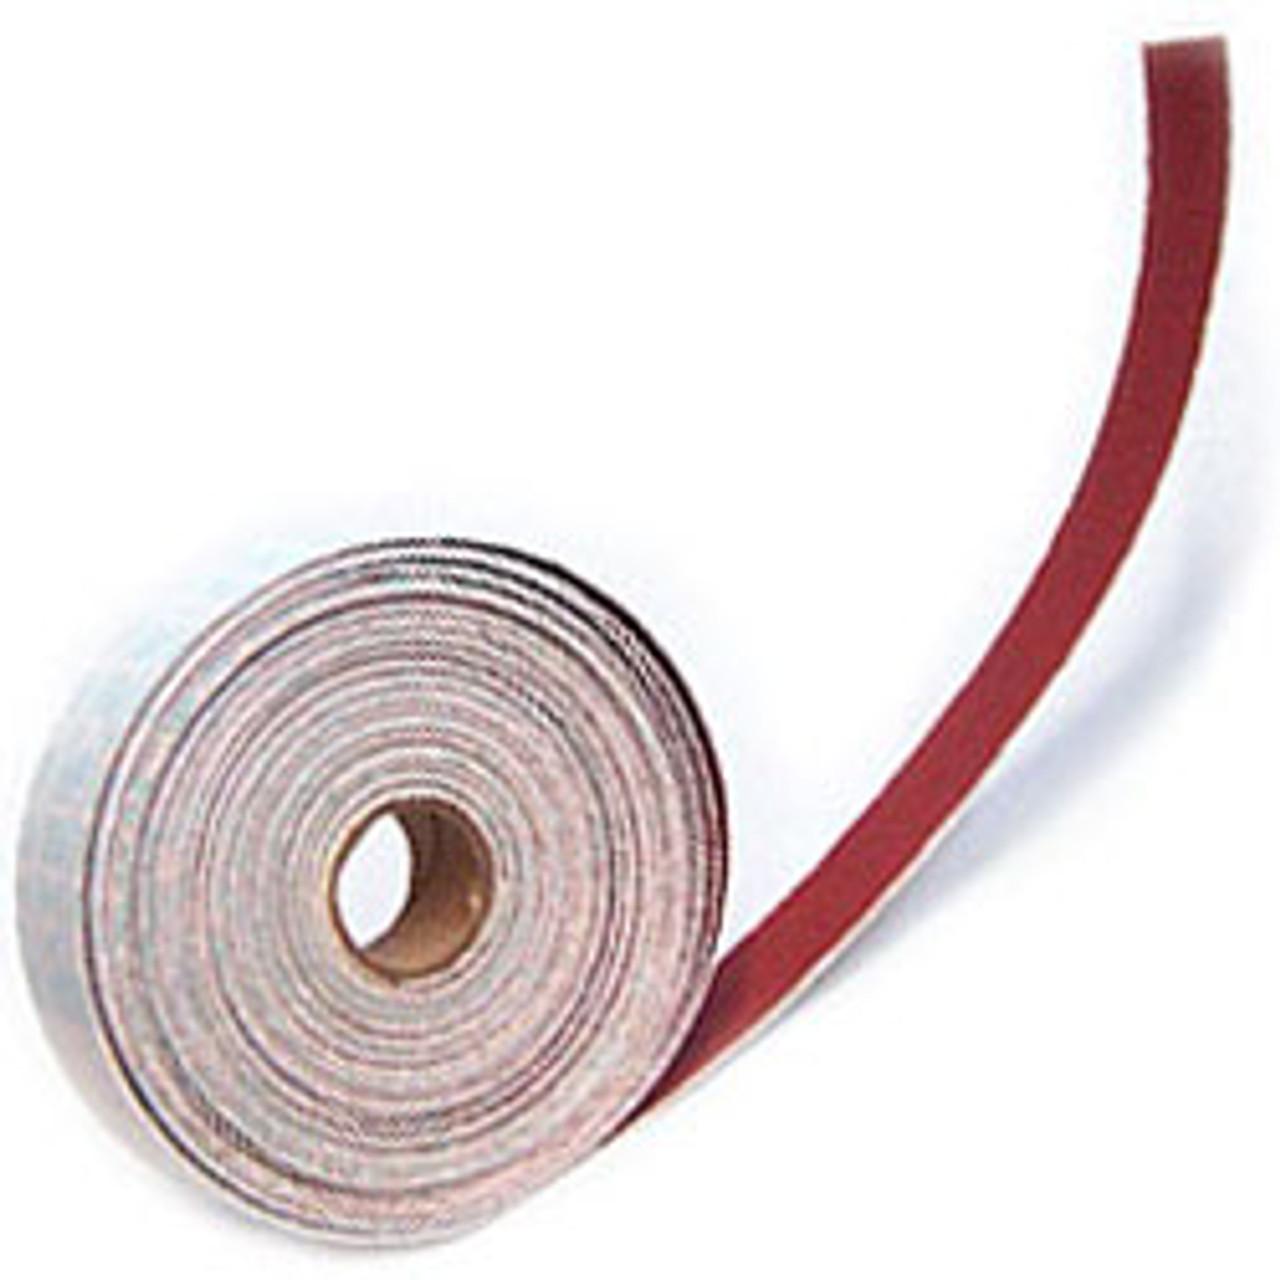 "Klingspor Abrasives Heavyweight Aluminum Oxide, 1-1/8""x 10 Meter (33') Hook & Loop Roll, 220 Grit"